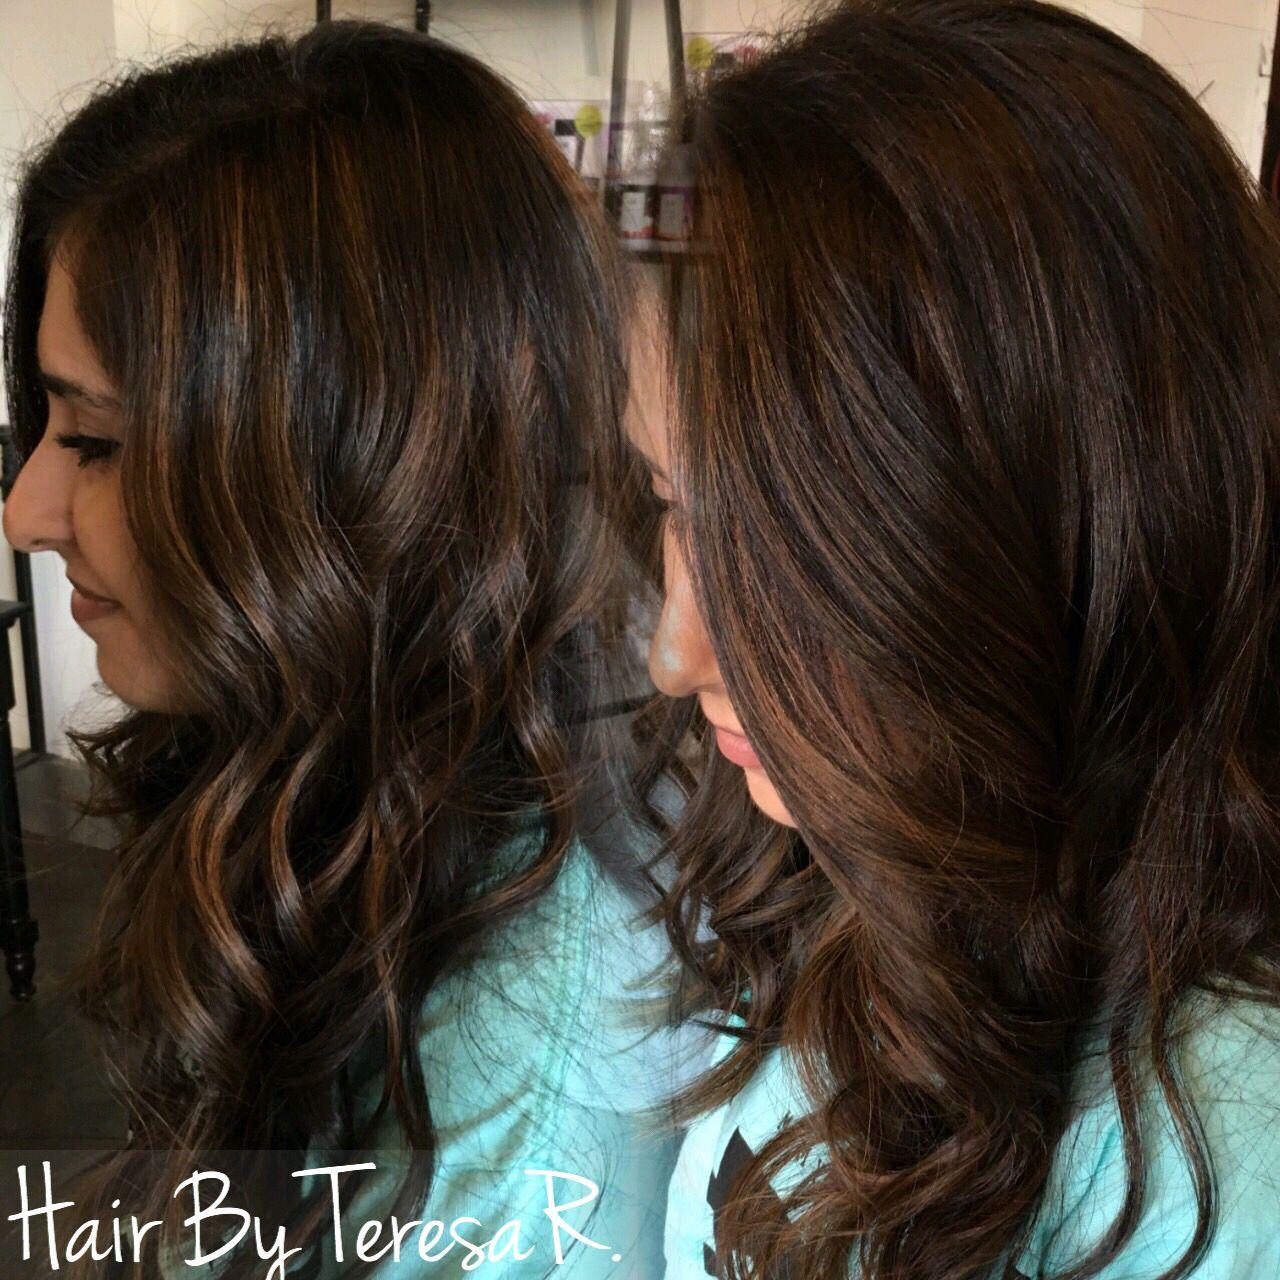 Natural Highlights On Dark Hair Hair Inspiration Pinterest